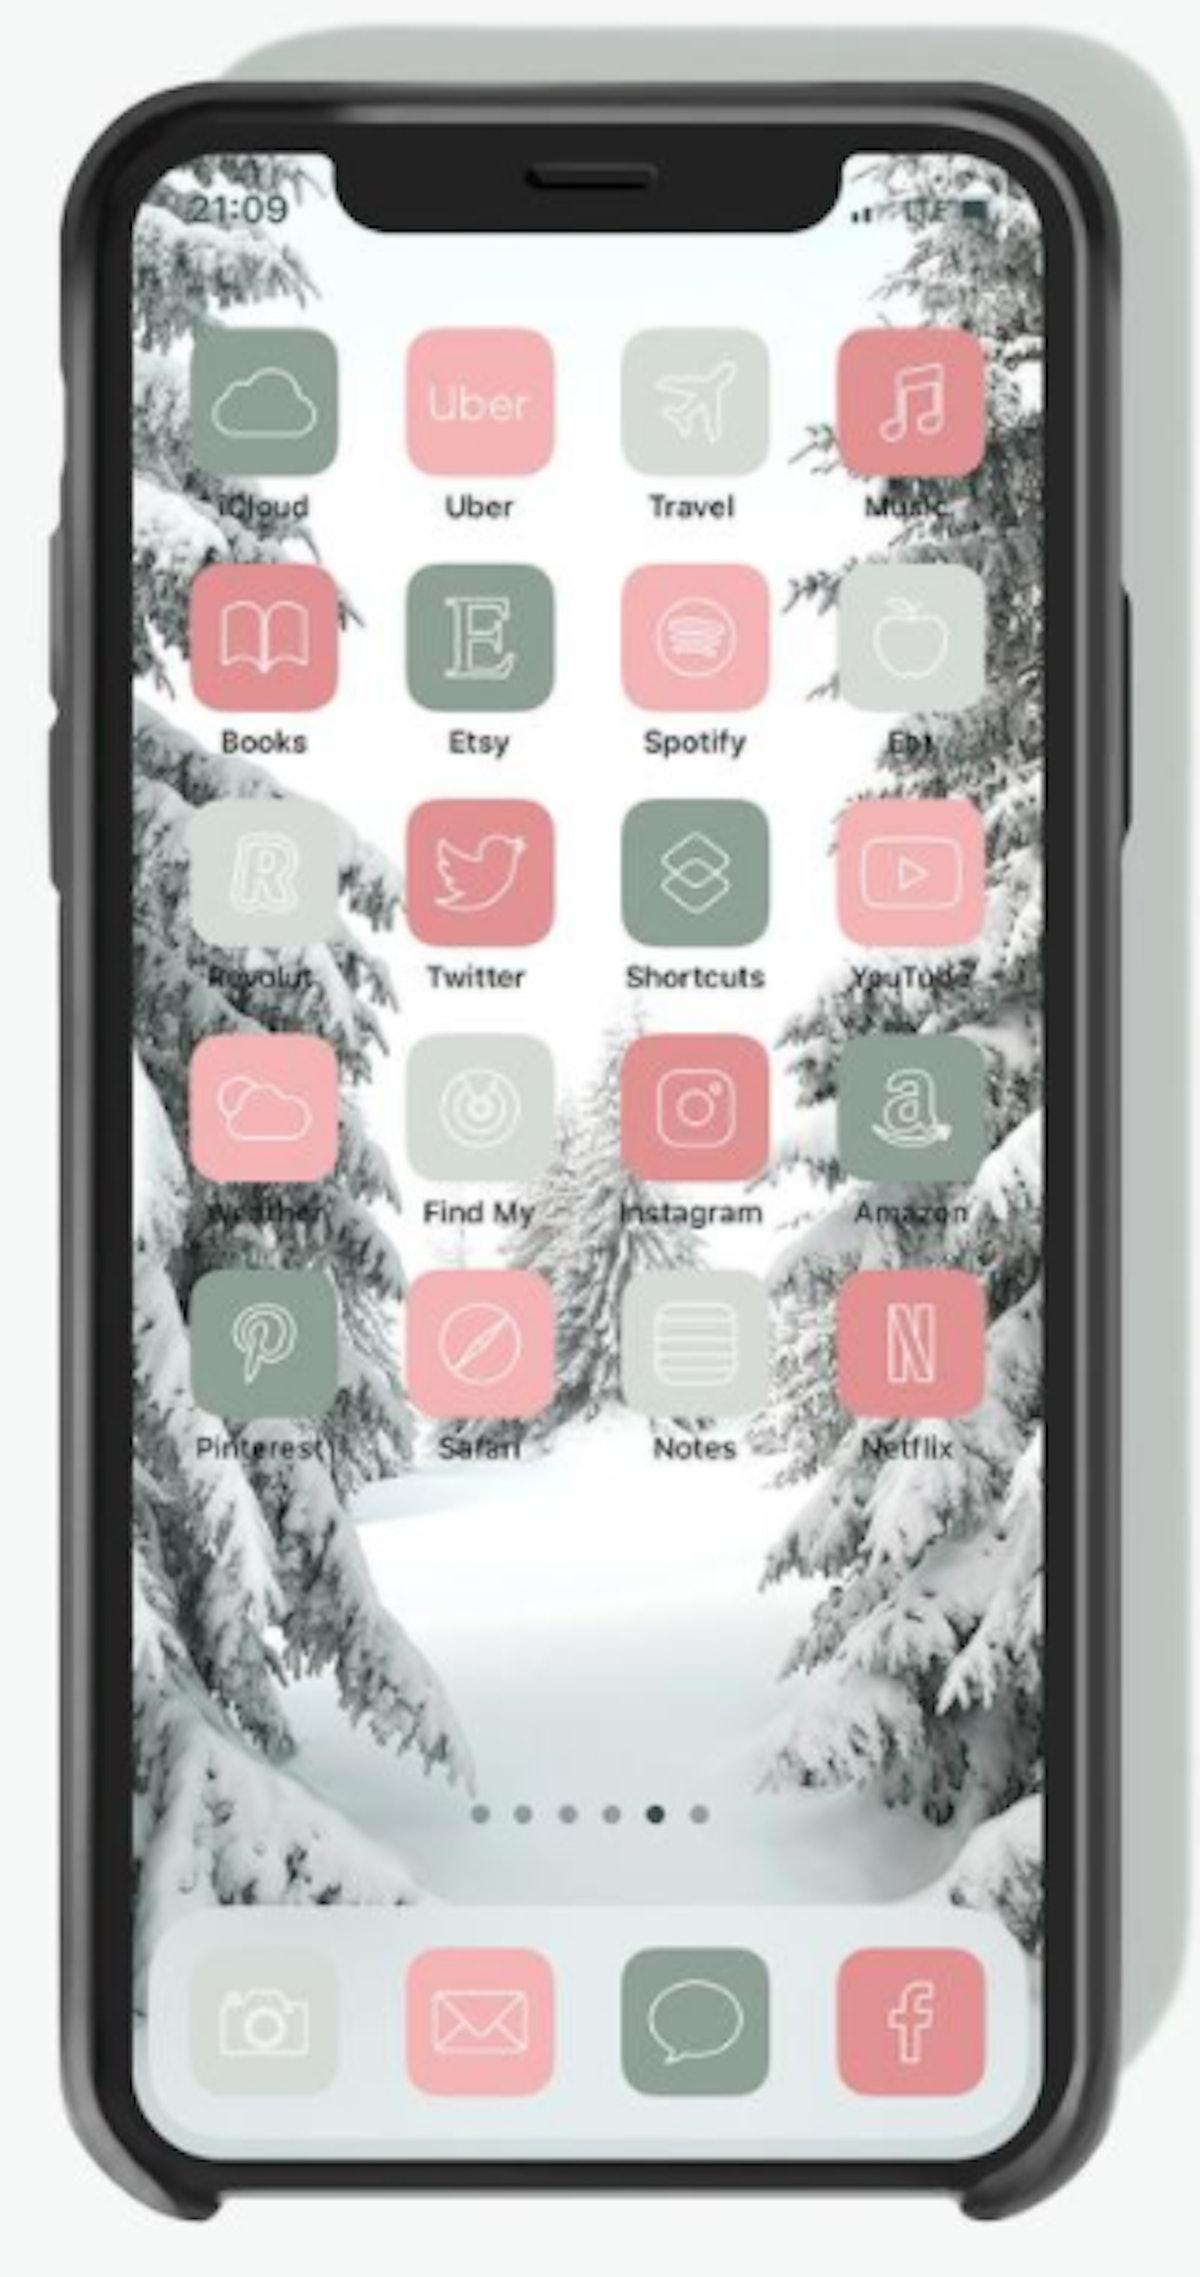 Pastel Aesthetic Winter iOS 14 Home Screen Design